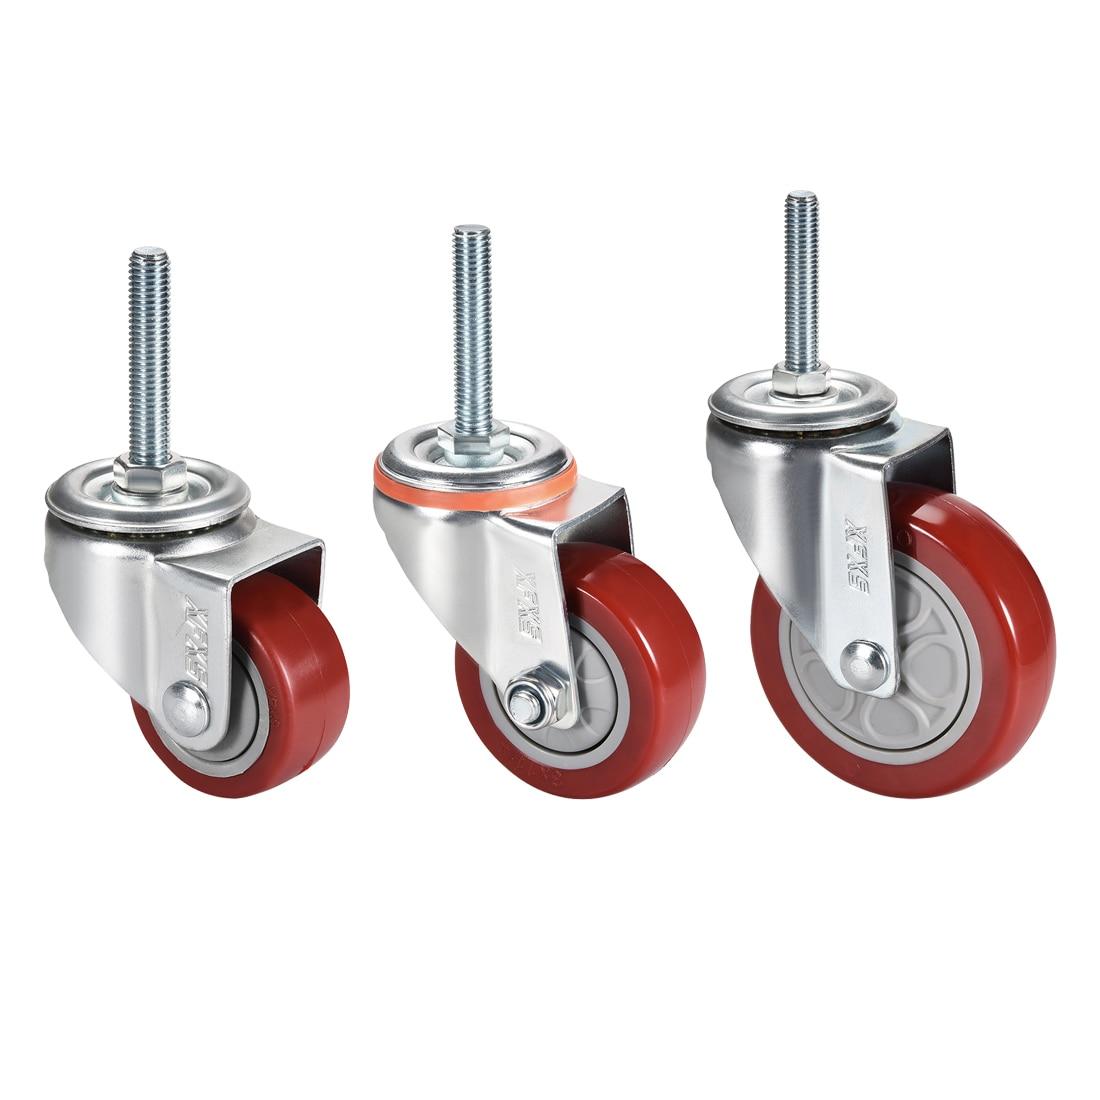 Rodízios rosqueados m12 x 60mm do plutônio da mobília da roda do rodízio do giro da roda do diâmetro de 5 polegadas de uxcell 1-4 pces 2.5 polegadas 3 polegadas